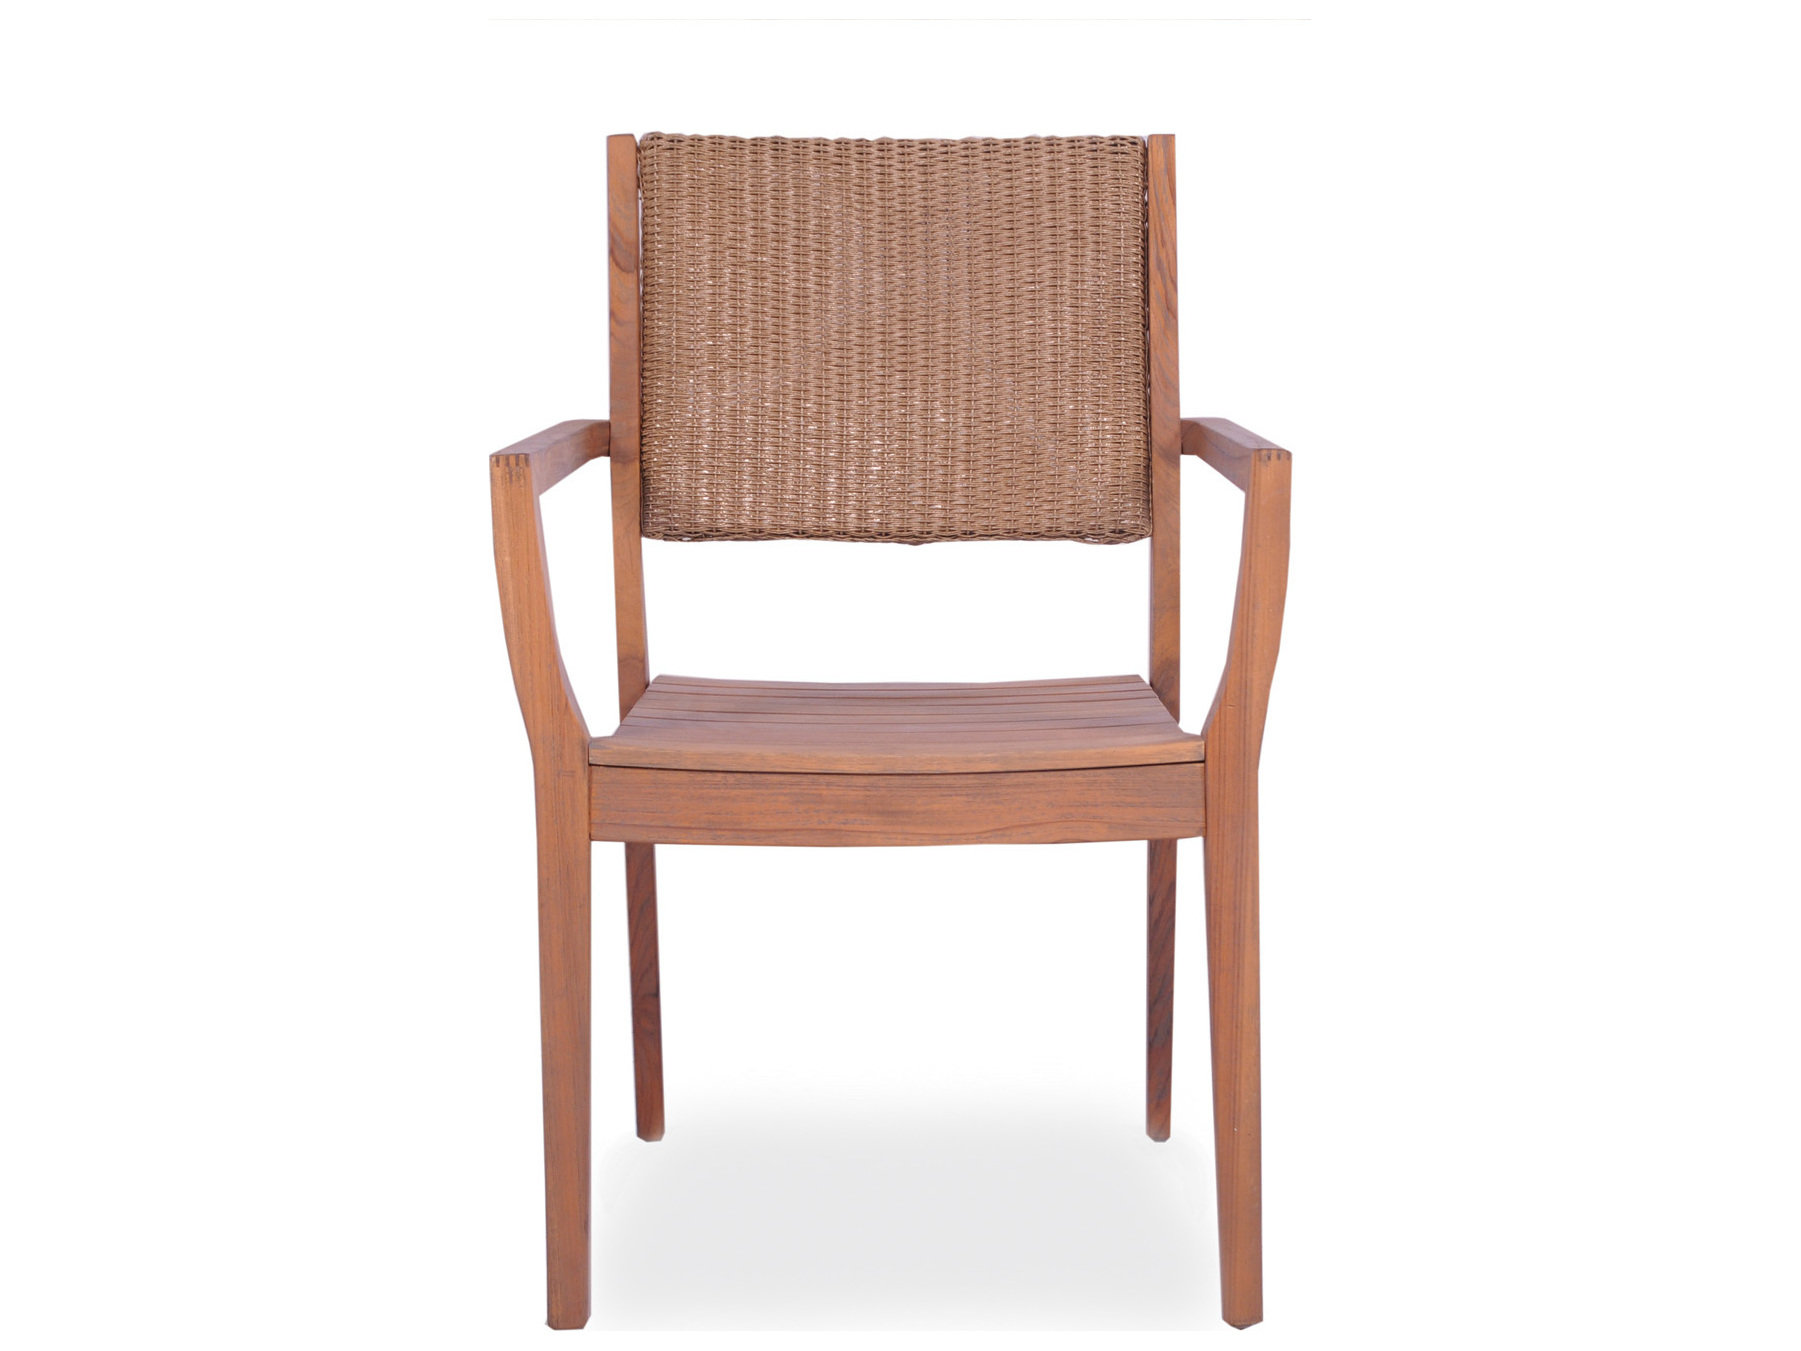 Lloyd Flanders Teak Dining Arm Chair with Loom Back 286201 : LF2862014zm from www.patiocontract.com size 1801 x 1351 jpeg 79kB